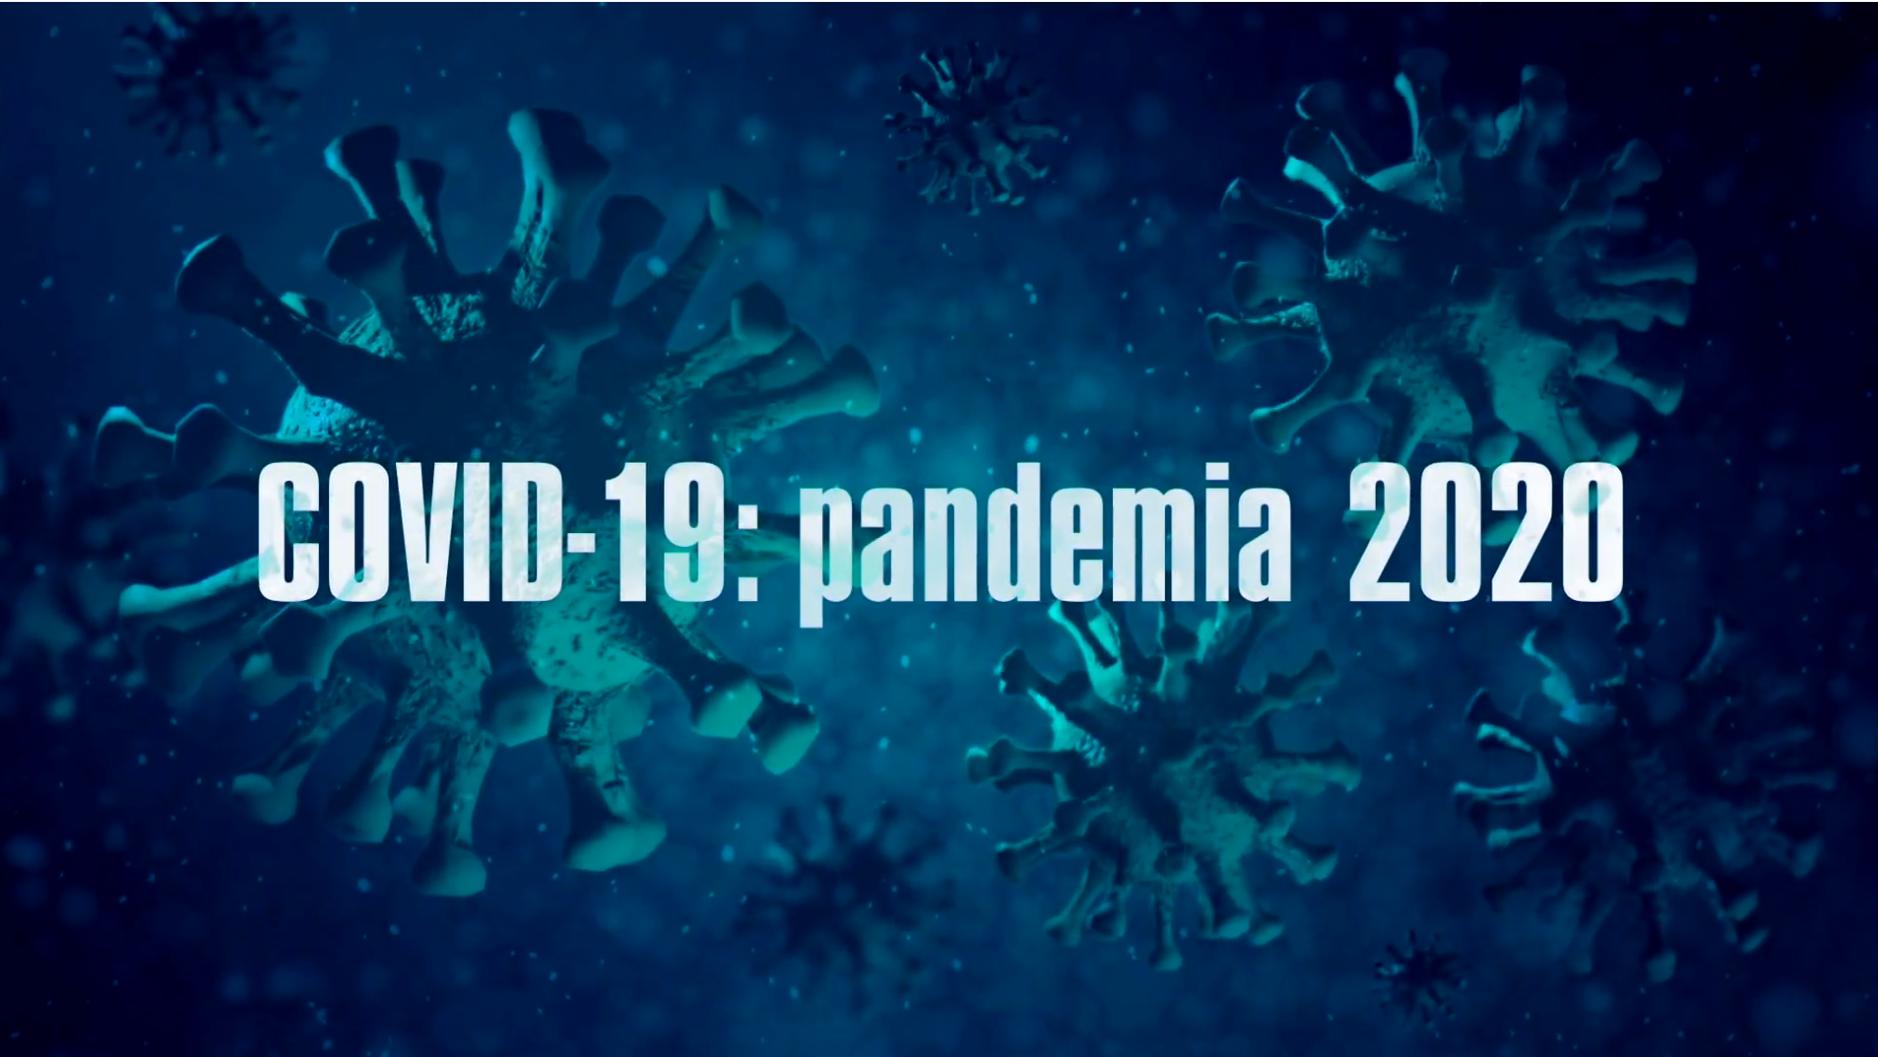 COVID-19: pandemia 2020